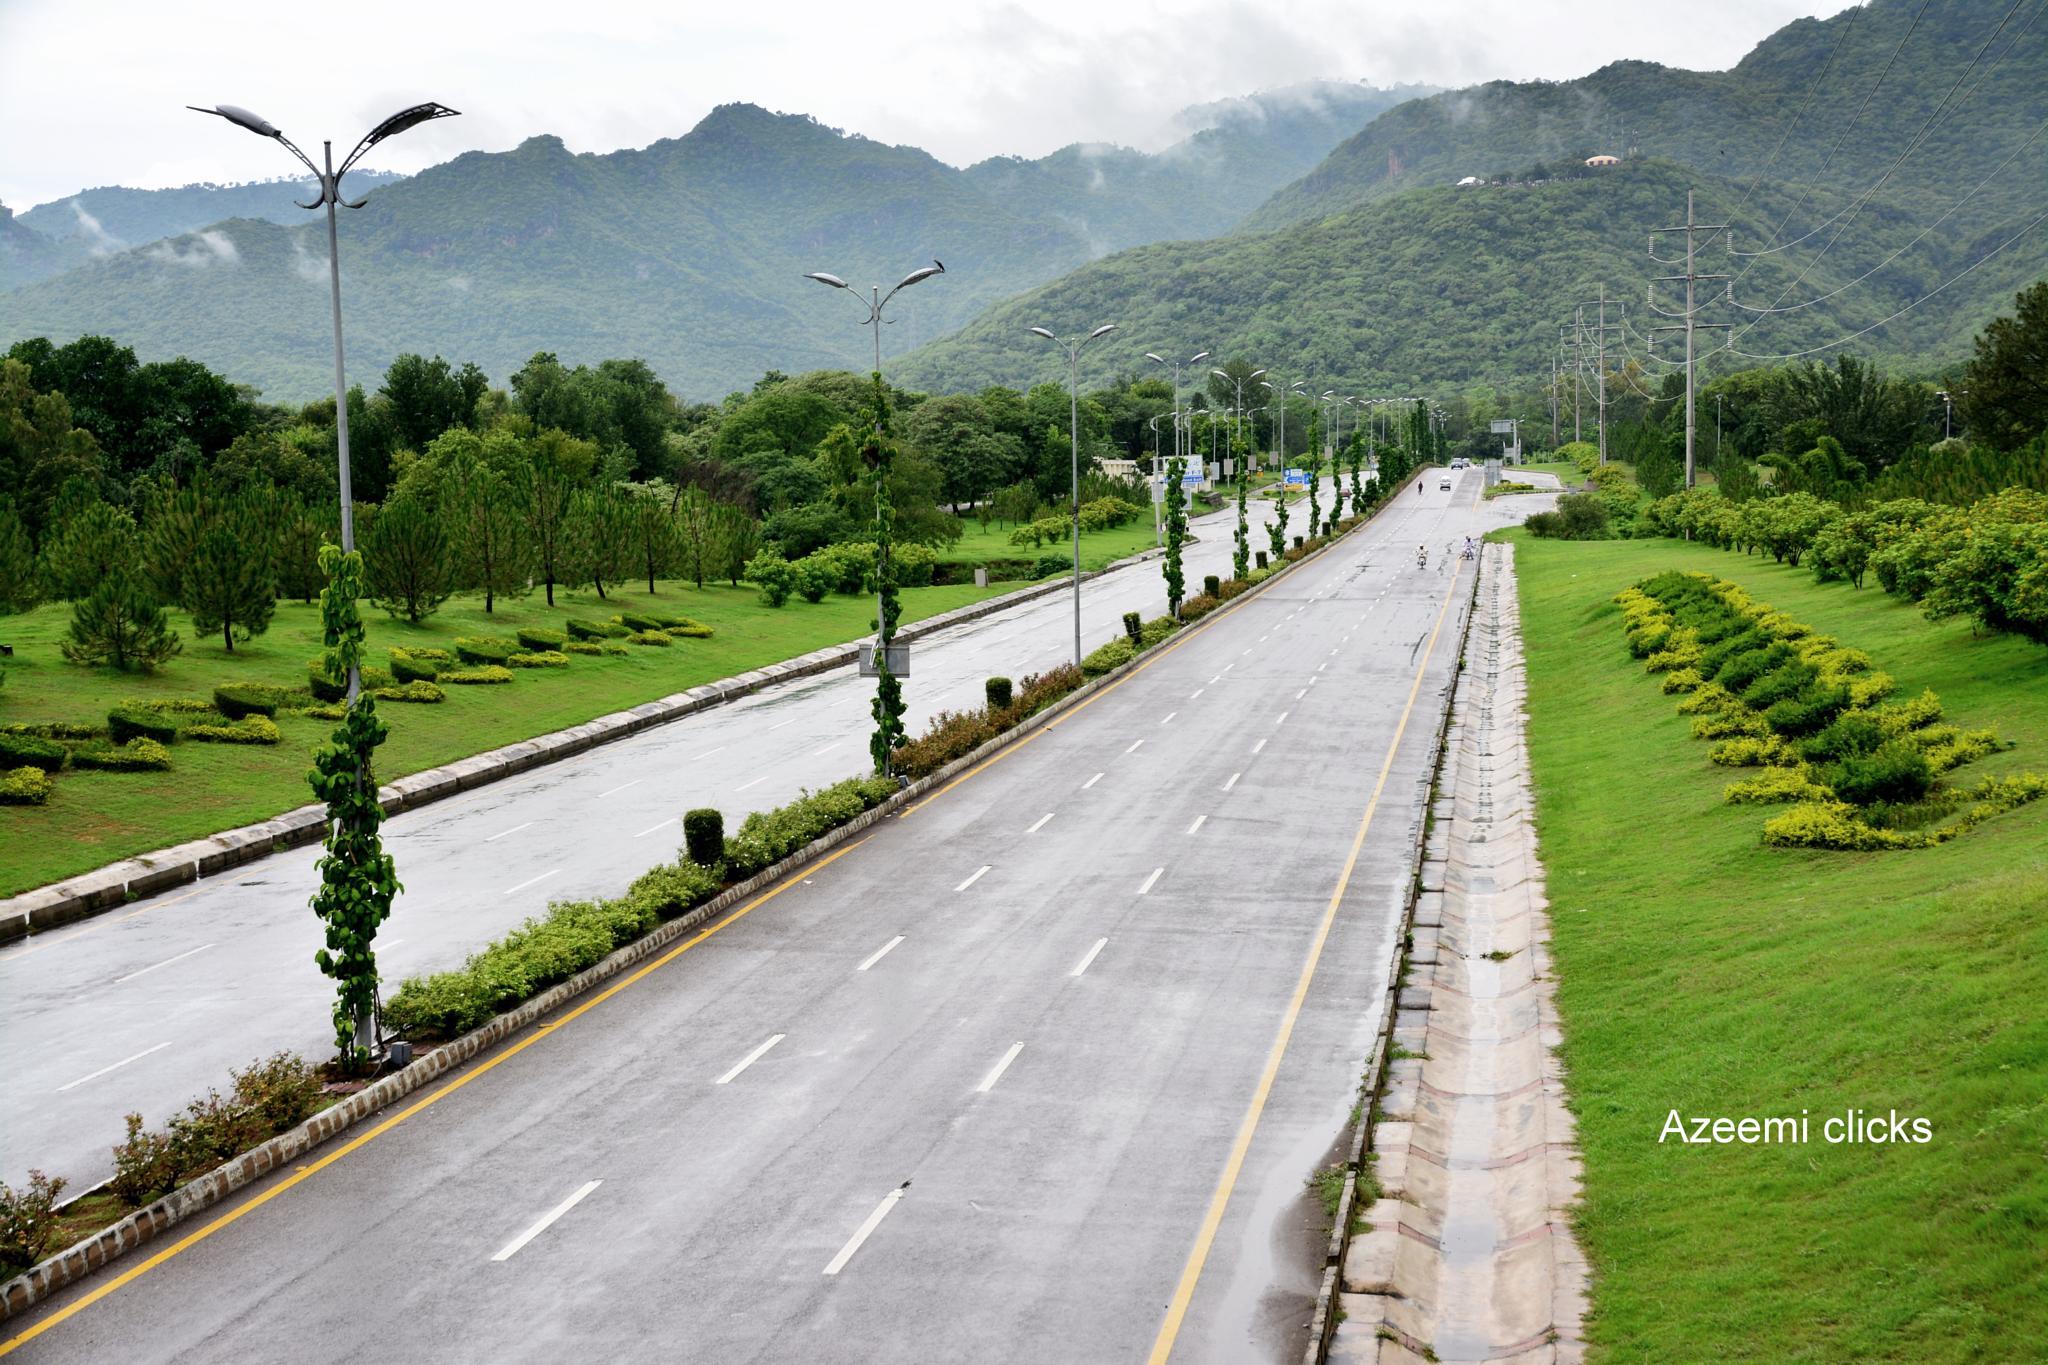 Islamabad after the rain by azeemiclicks